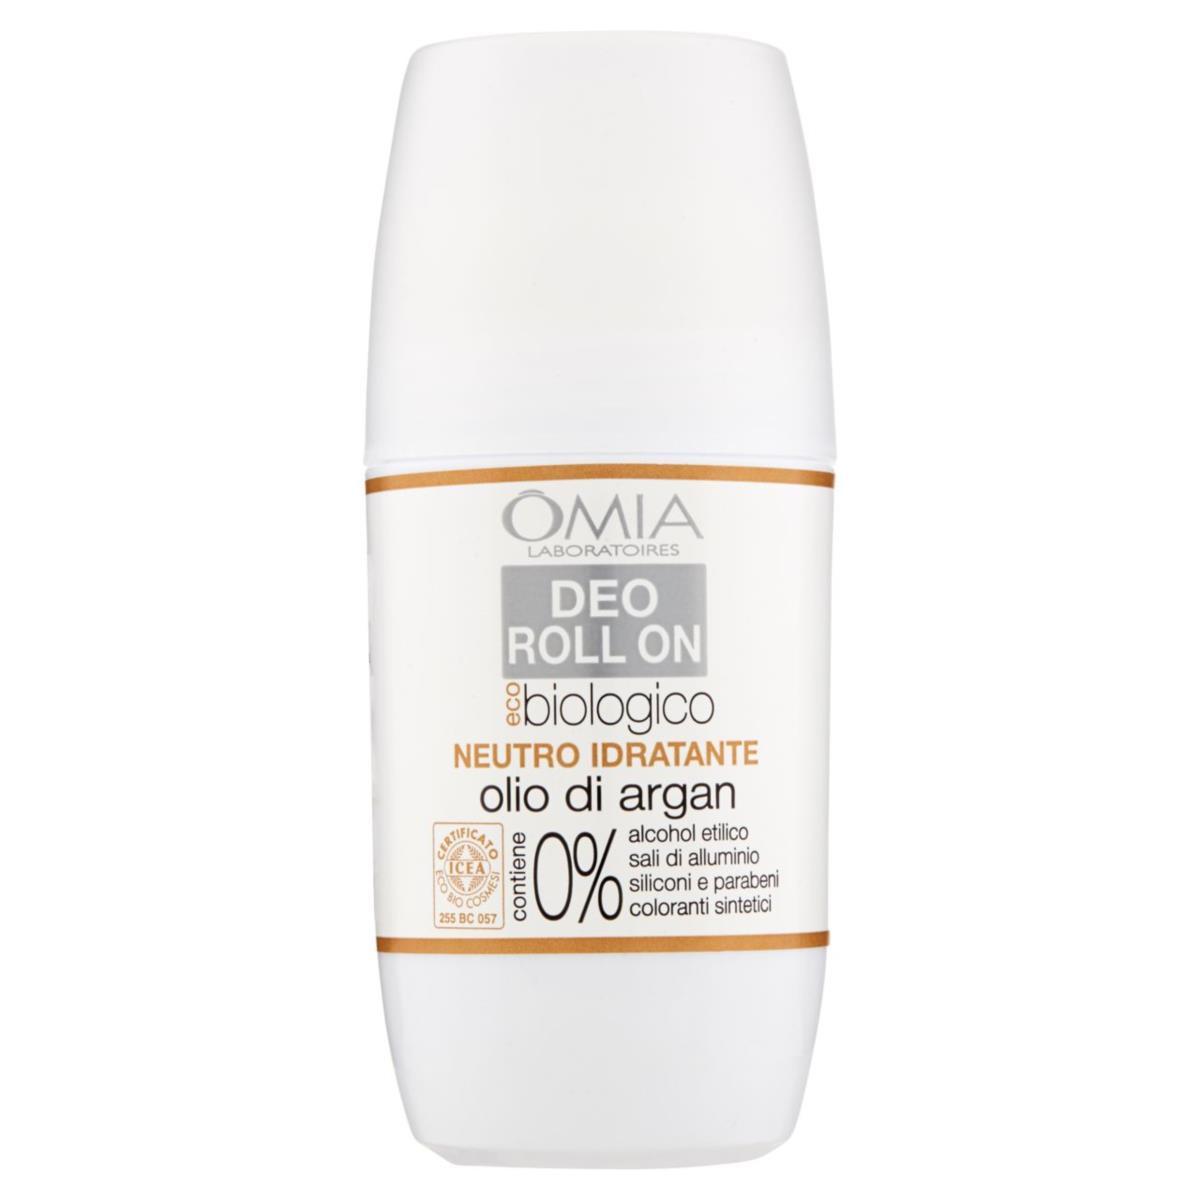 OMIA Deodorante Roll On Eco-biologico Neutro Idratante all'olio d'Argan 50ml